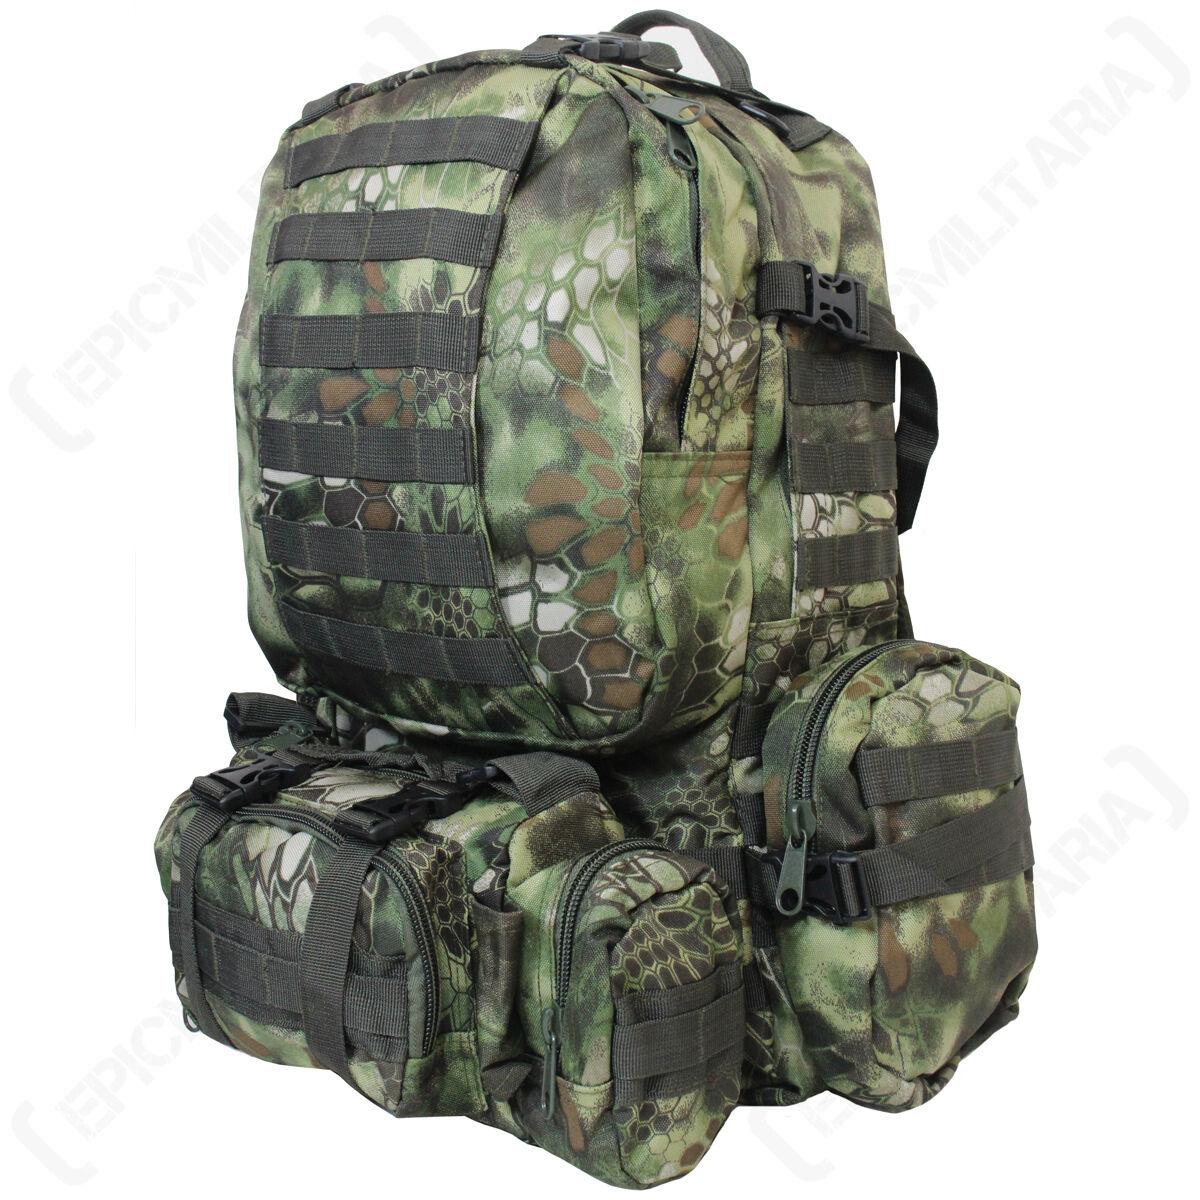 Mandra Woodland Camo MOLLE Defense Pack - Rucksack Backpack Tasche Military 36L